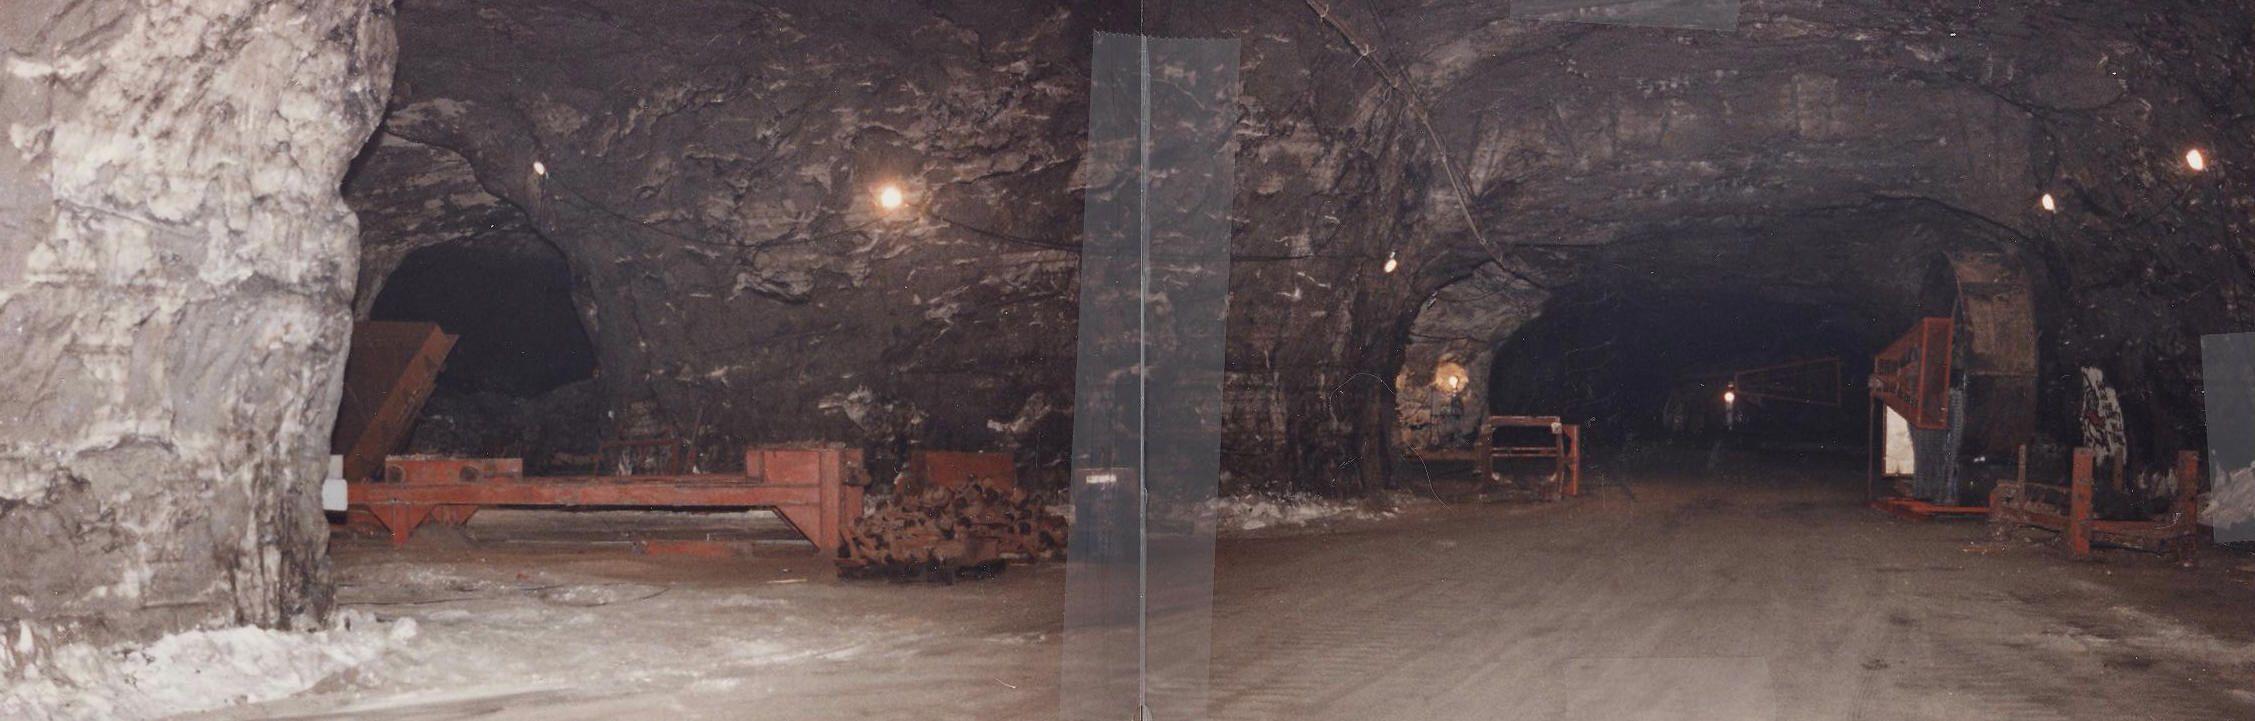 Location Photos Of Detroit Salt Mines